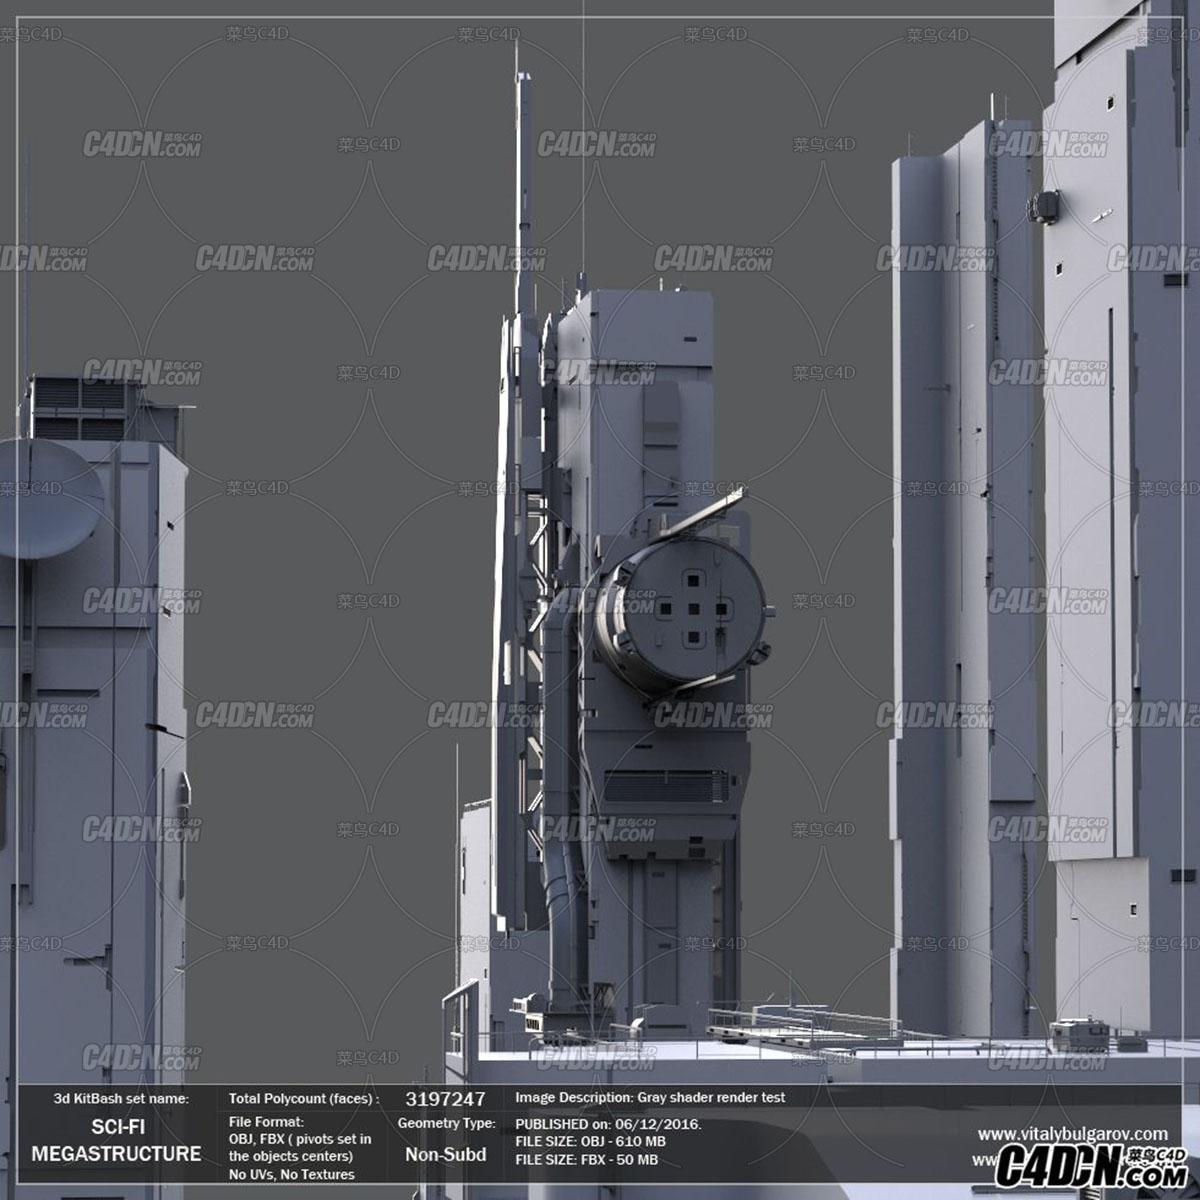 Megastructure_01.jpg